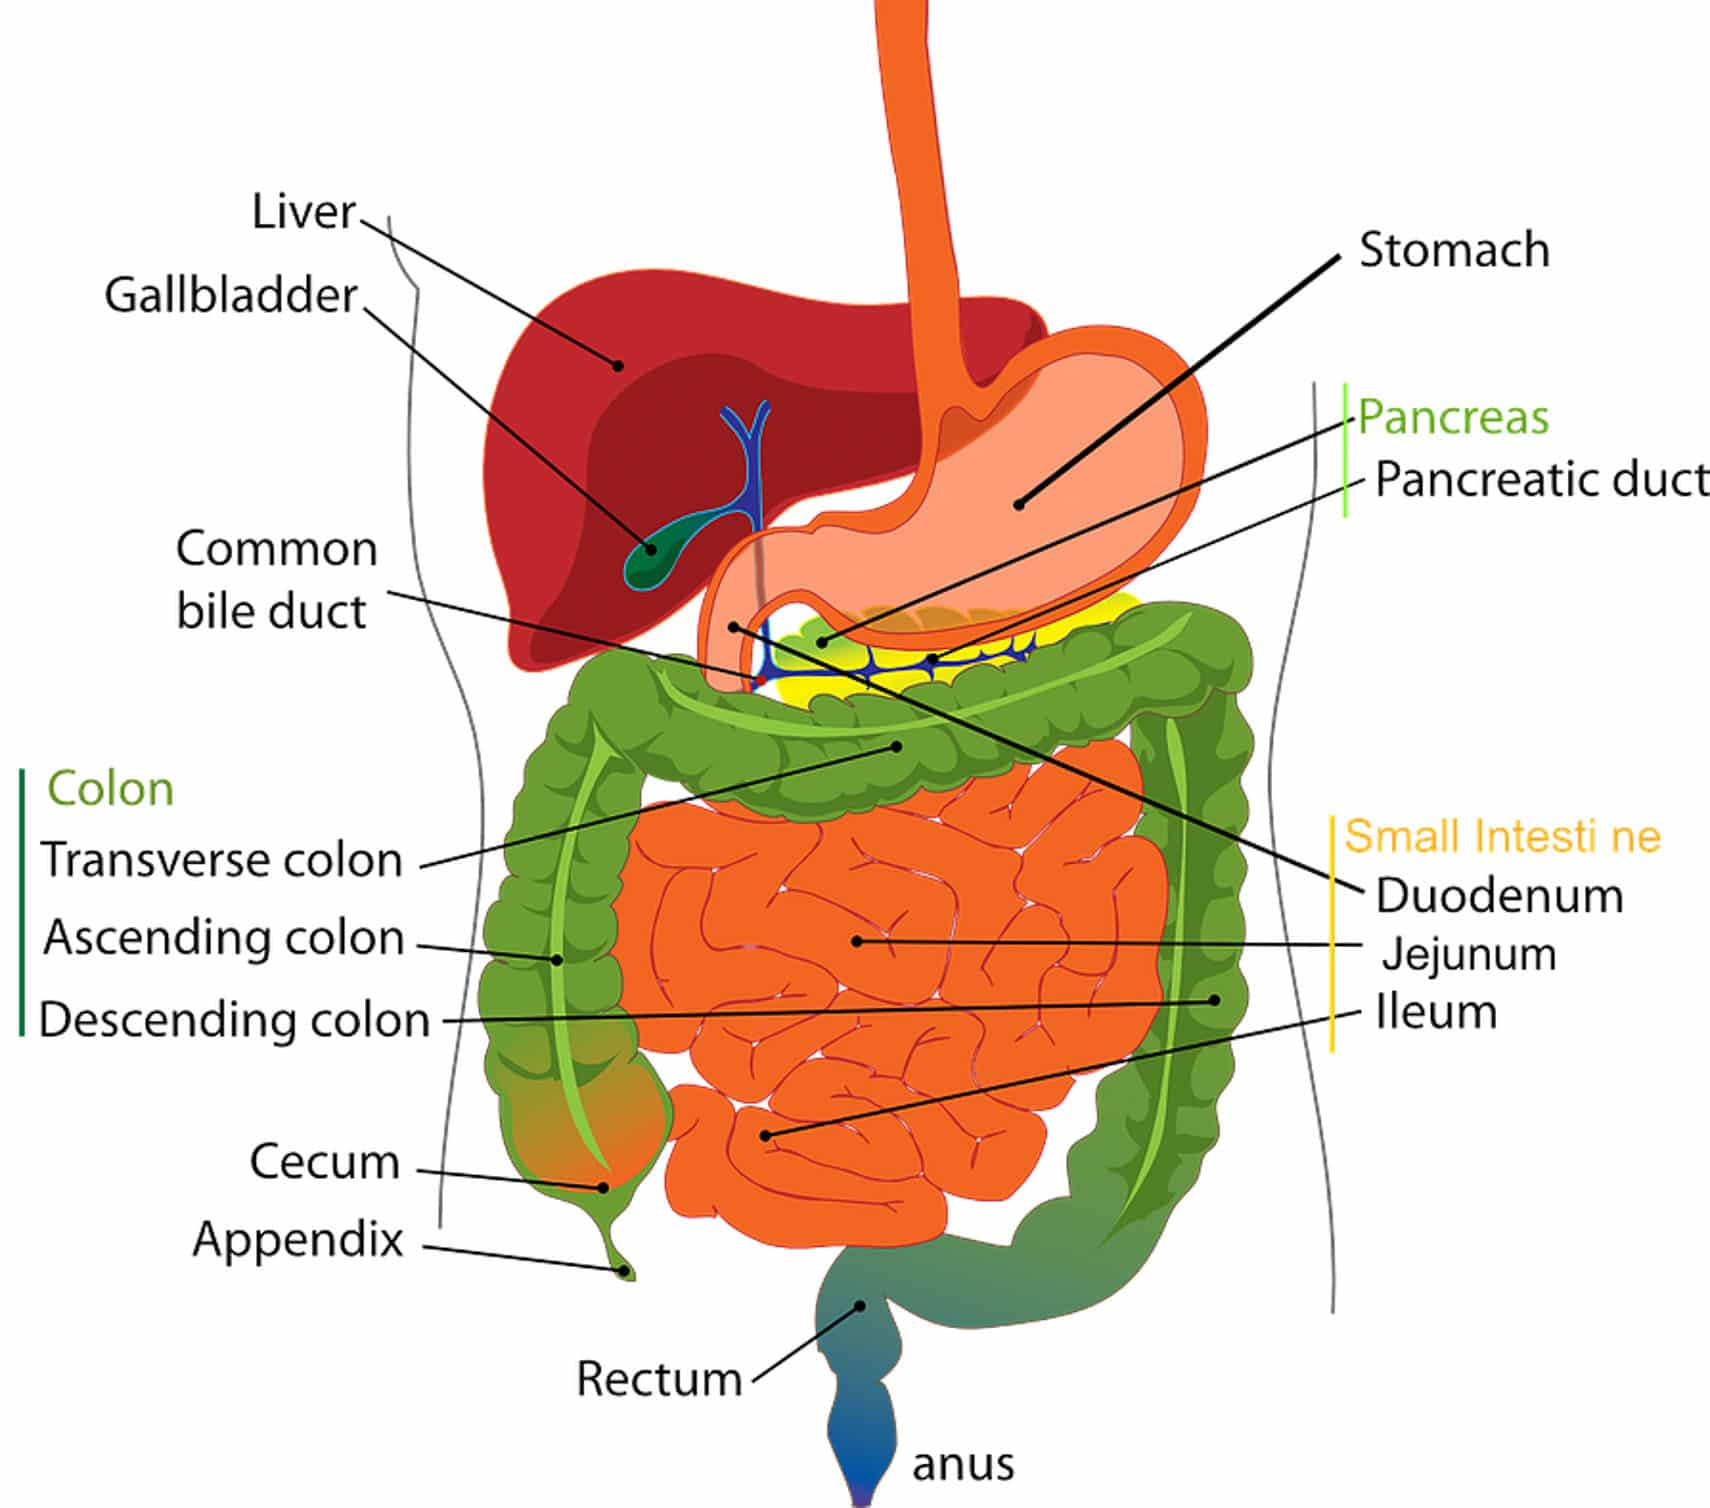 human liver diagram cat 5 wiring pdf vital organs digestive series the fodmap everyday